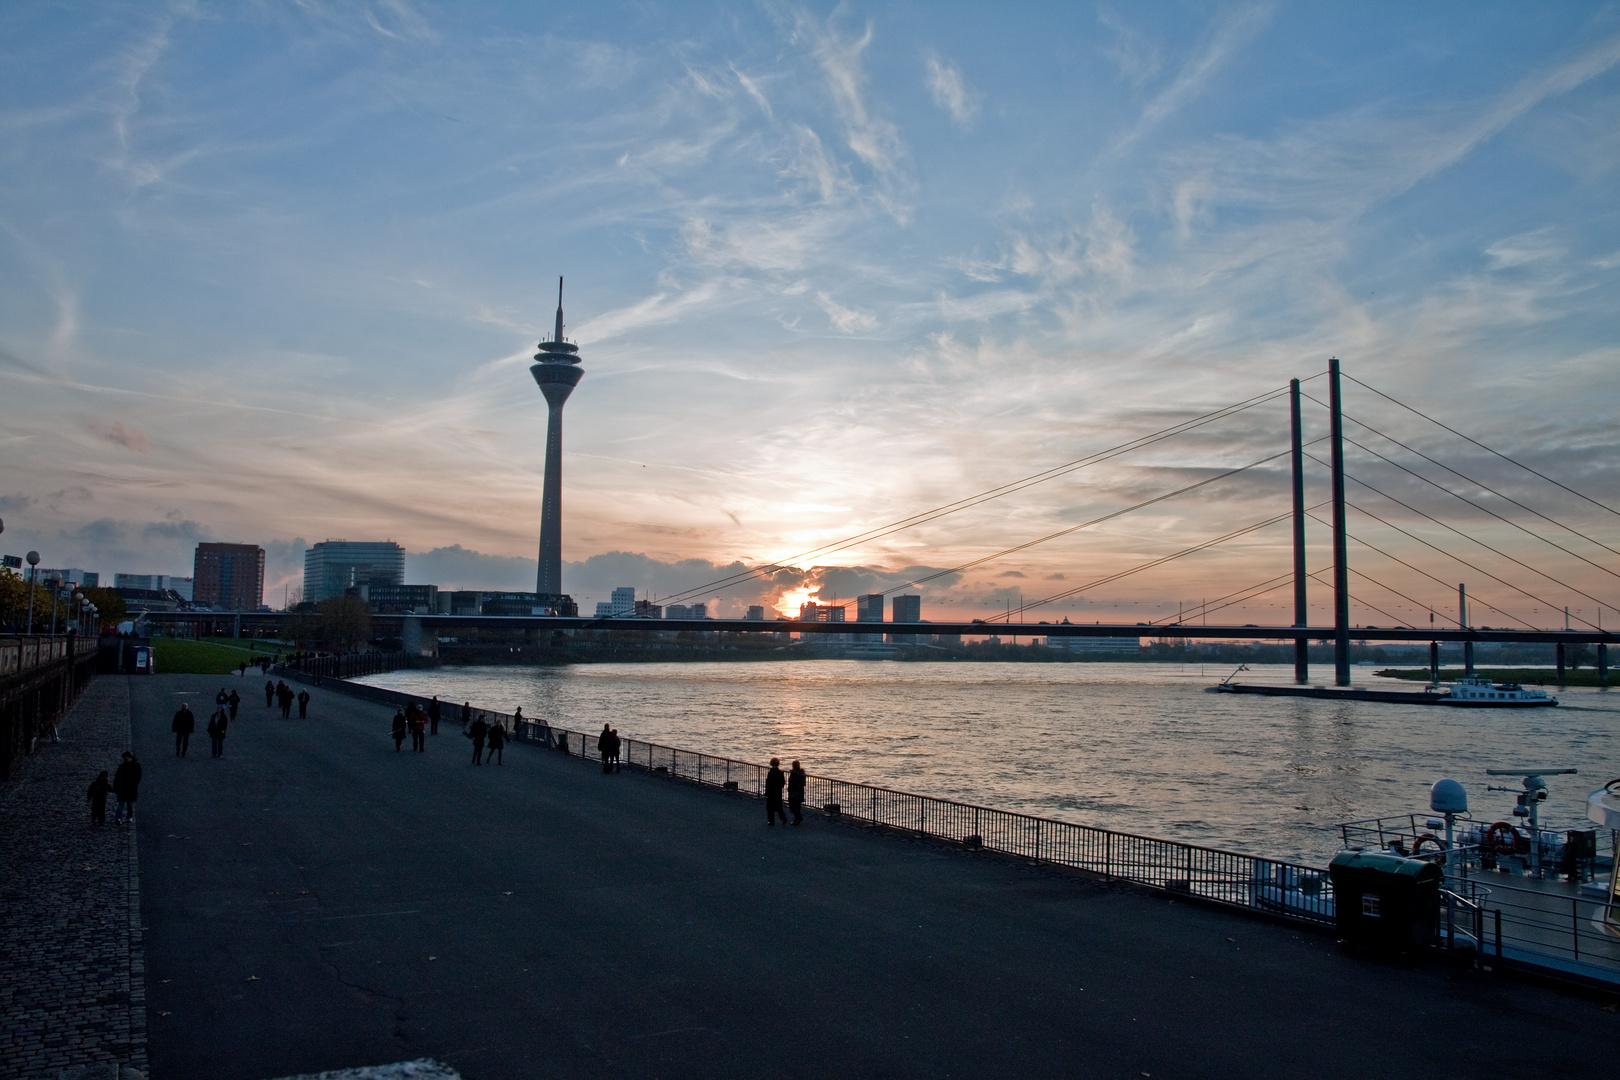 Nochmal Düsseldorf an der Rheinpromenade letzten Herbst